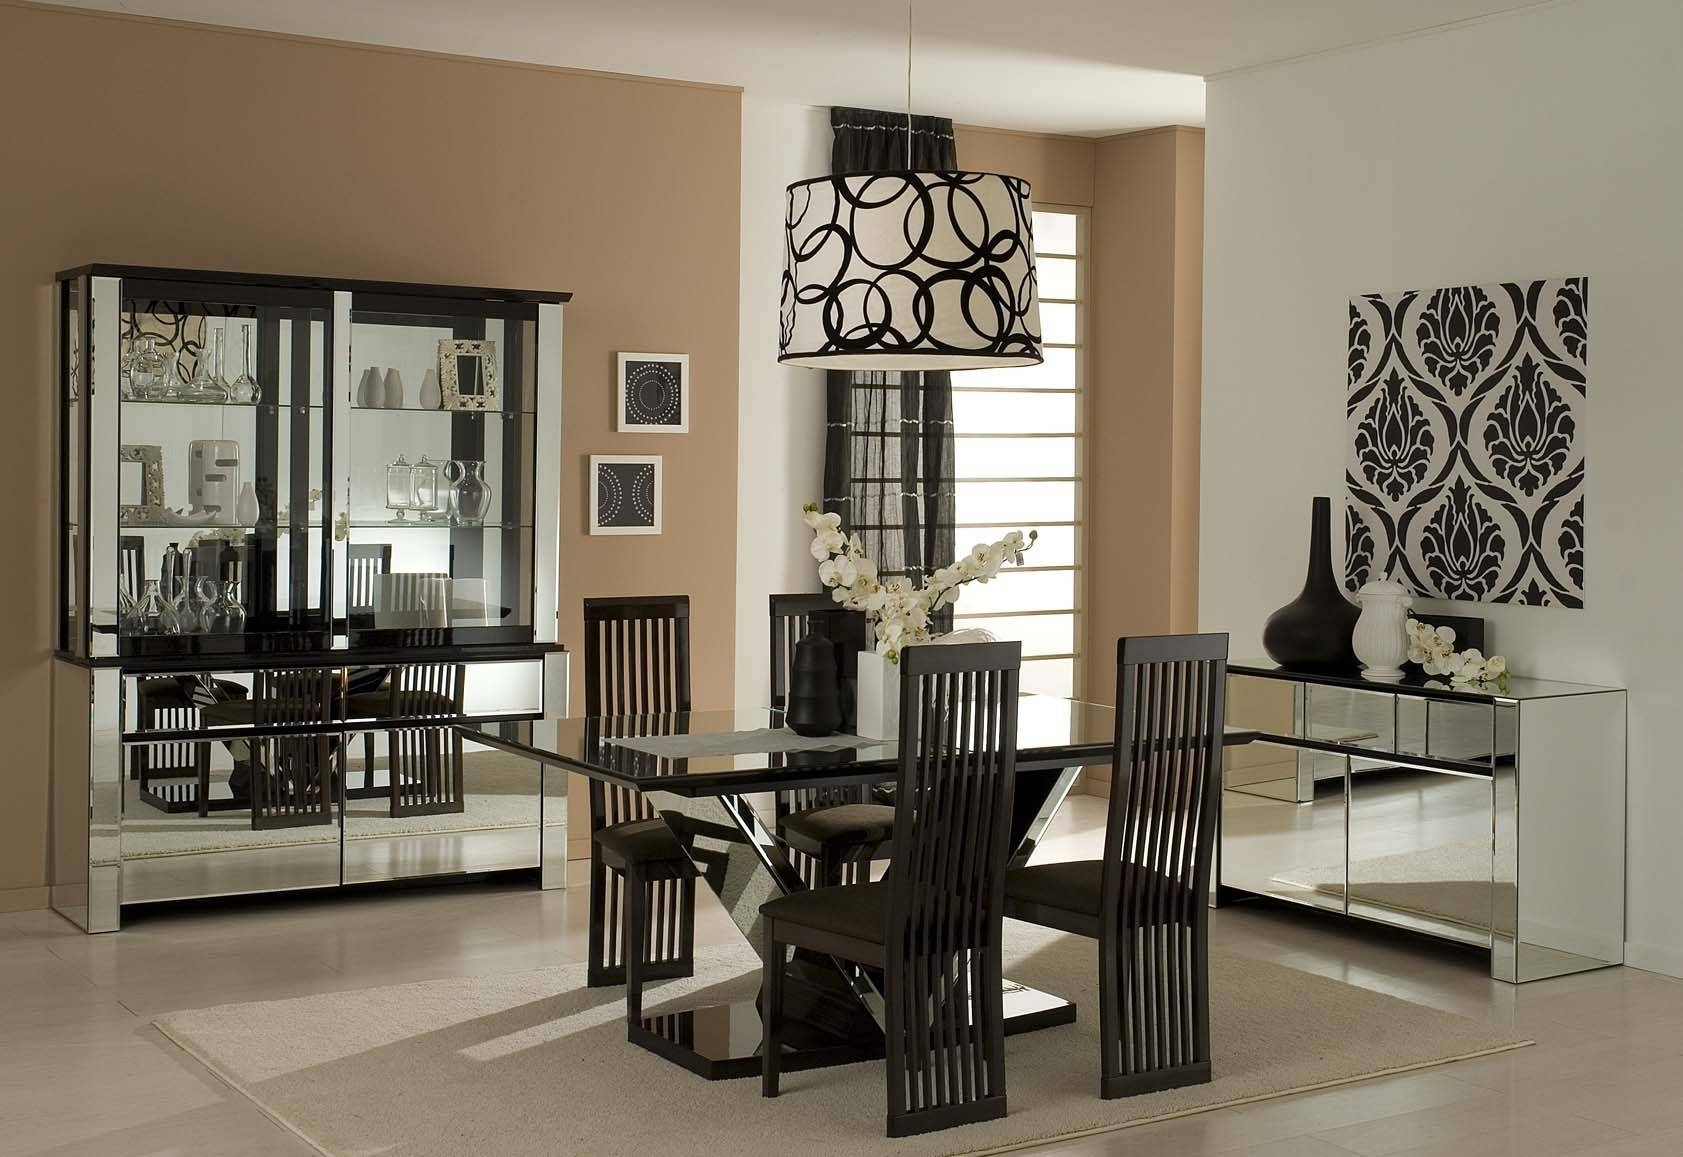 Modern Dining Room Decor Ideas Luxury Dining Room Decor Ideas For 2018 Modern Wall Art For Dining Room (View 12 of 15)